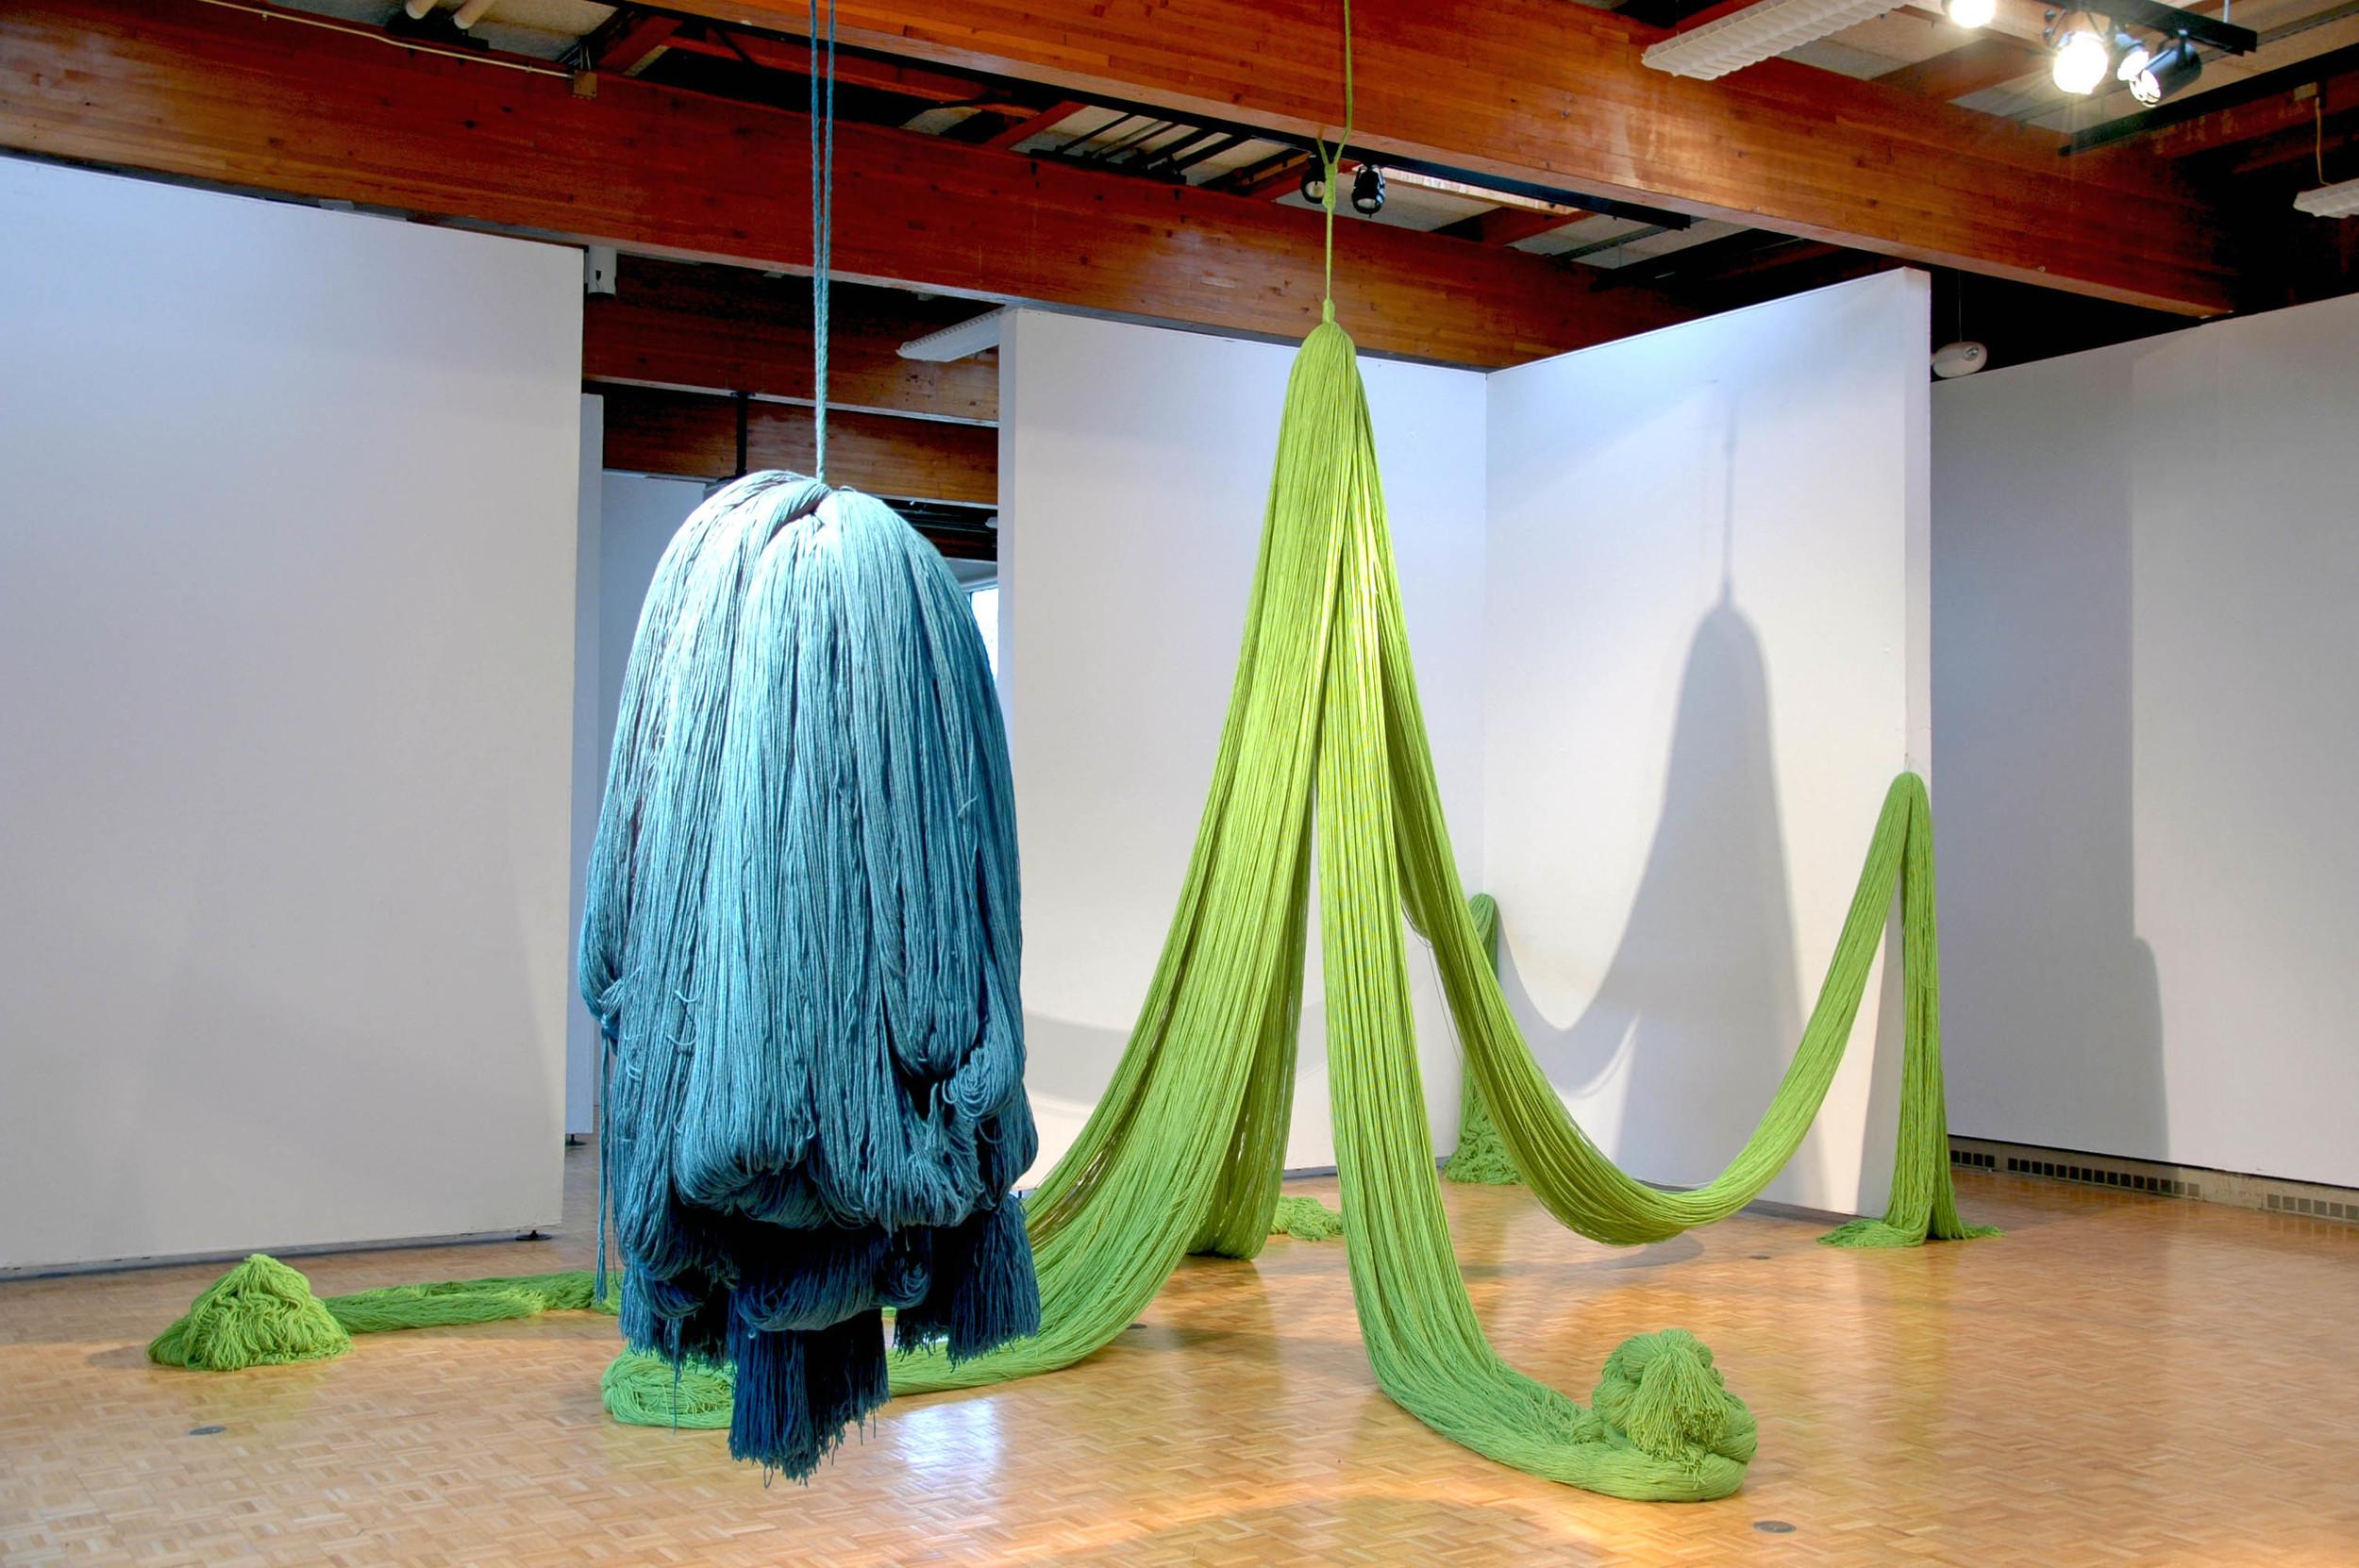 A Work in Progress: TRIM (Installation at Usdan Gallery, Bennington College), 2010, Acrylic yarn 14' x 40' x 80' (Installation detail)